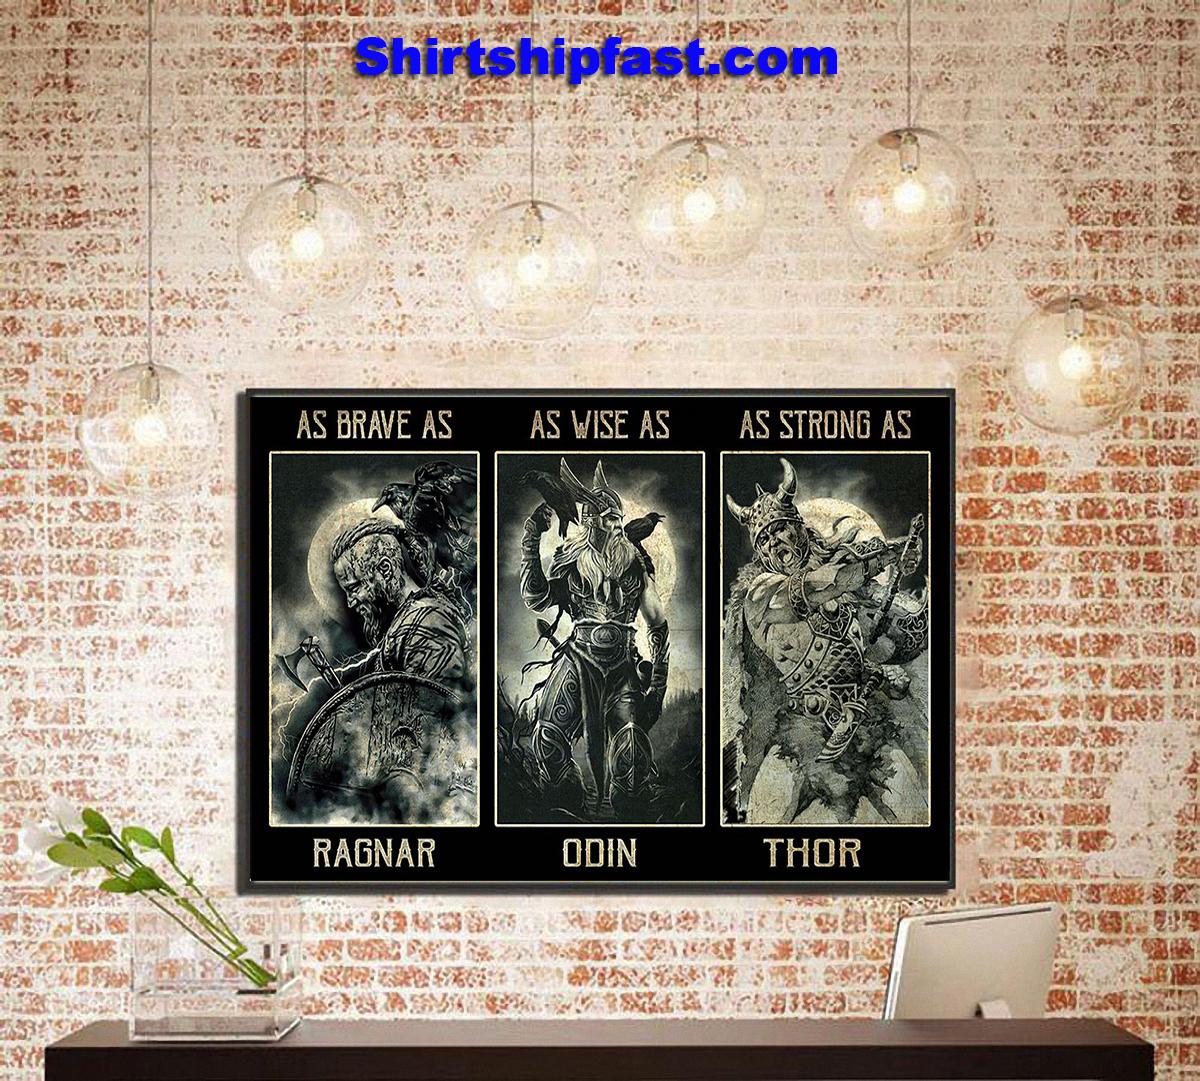 As brave as Ragnar poster